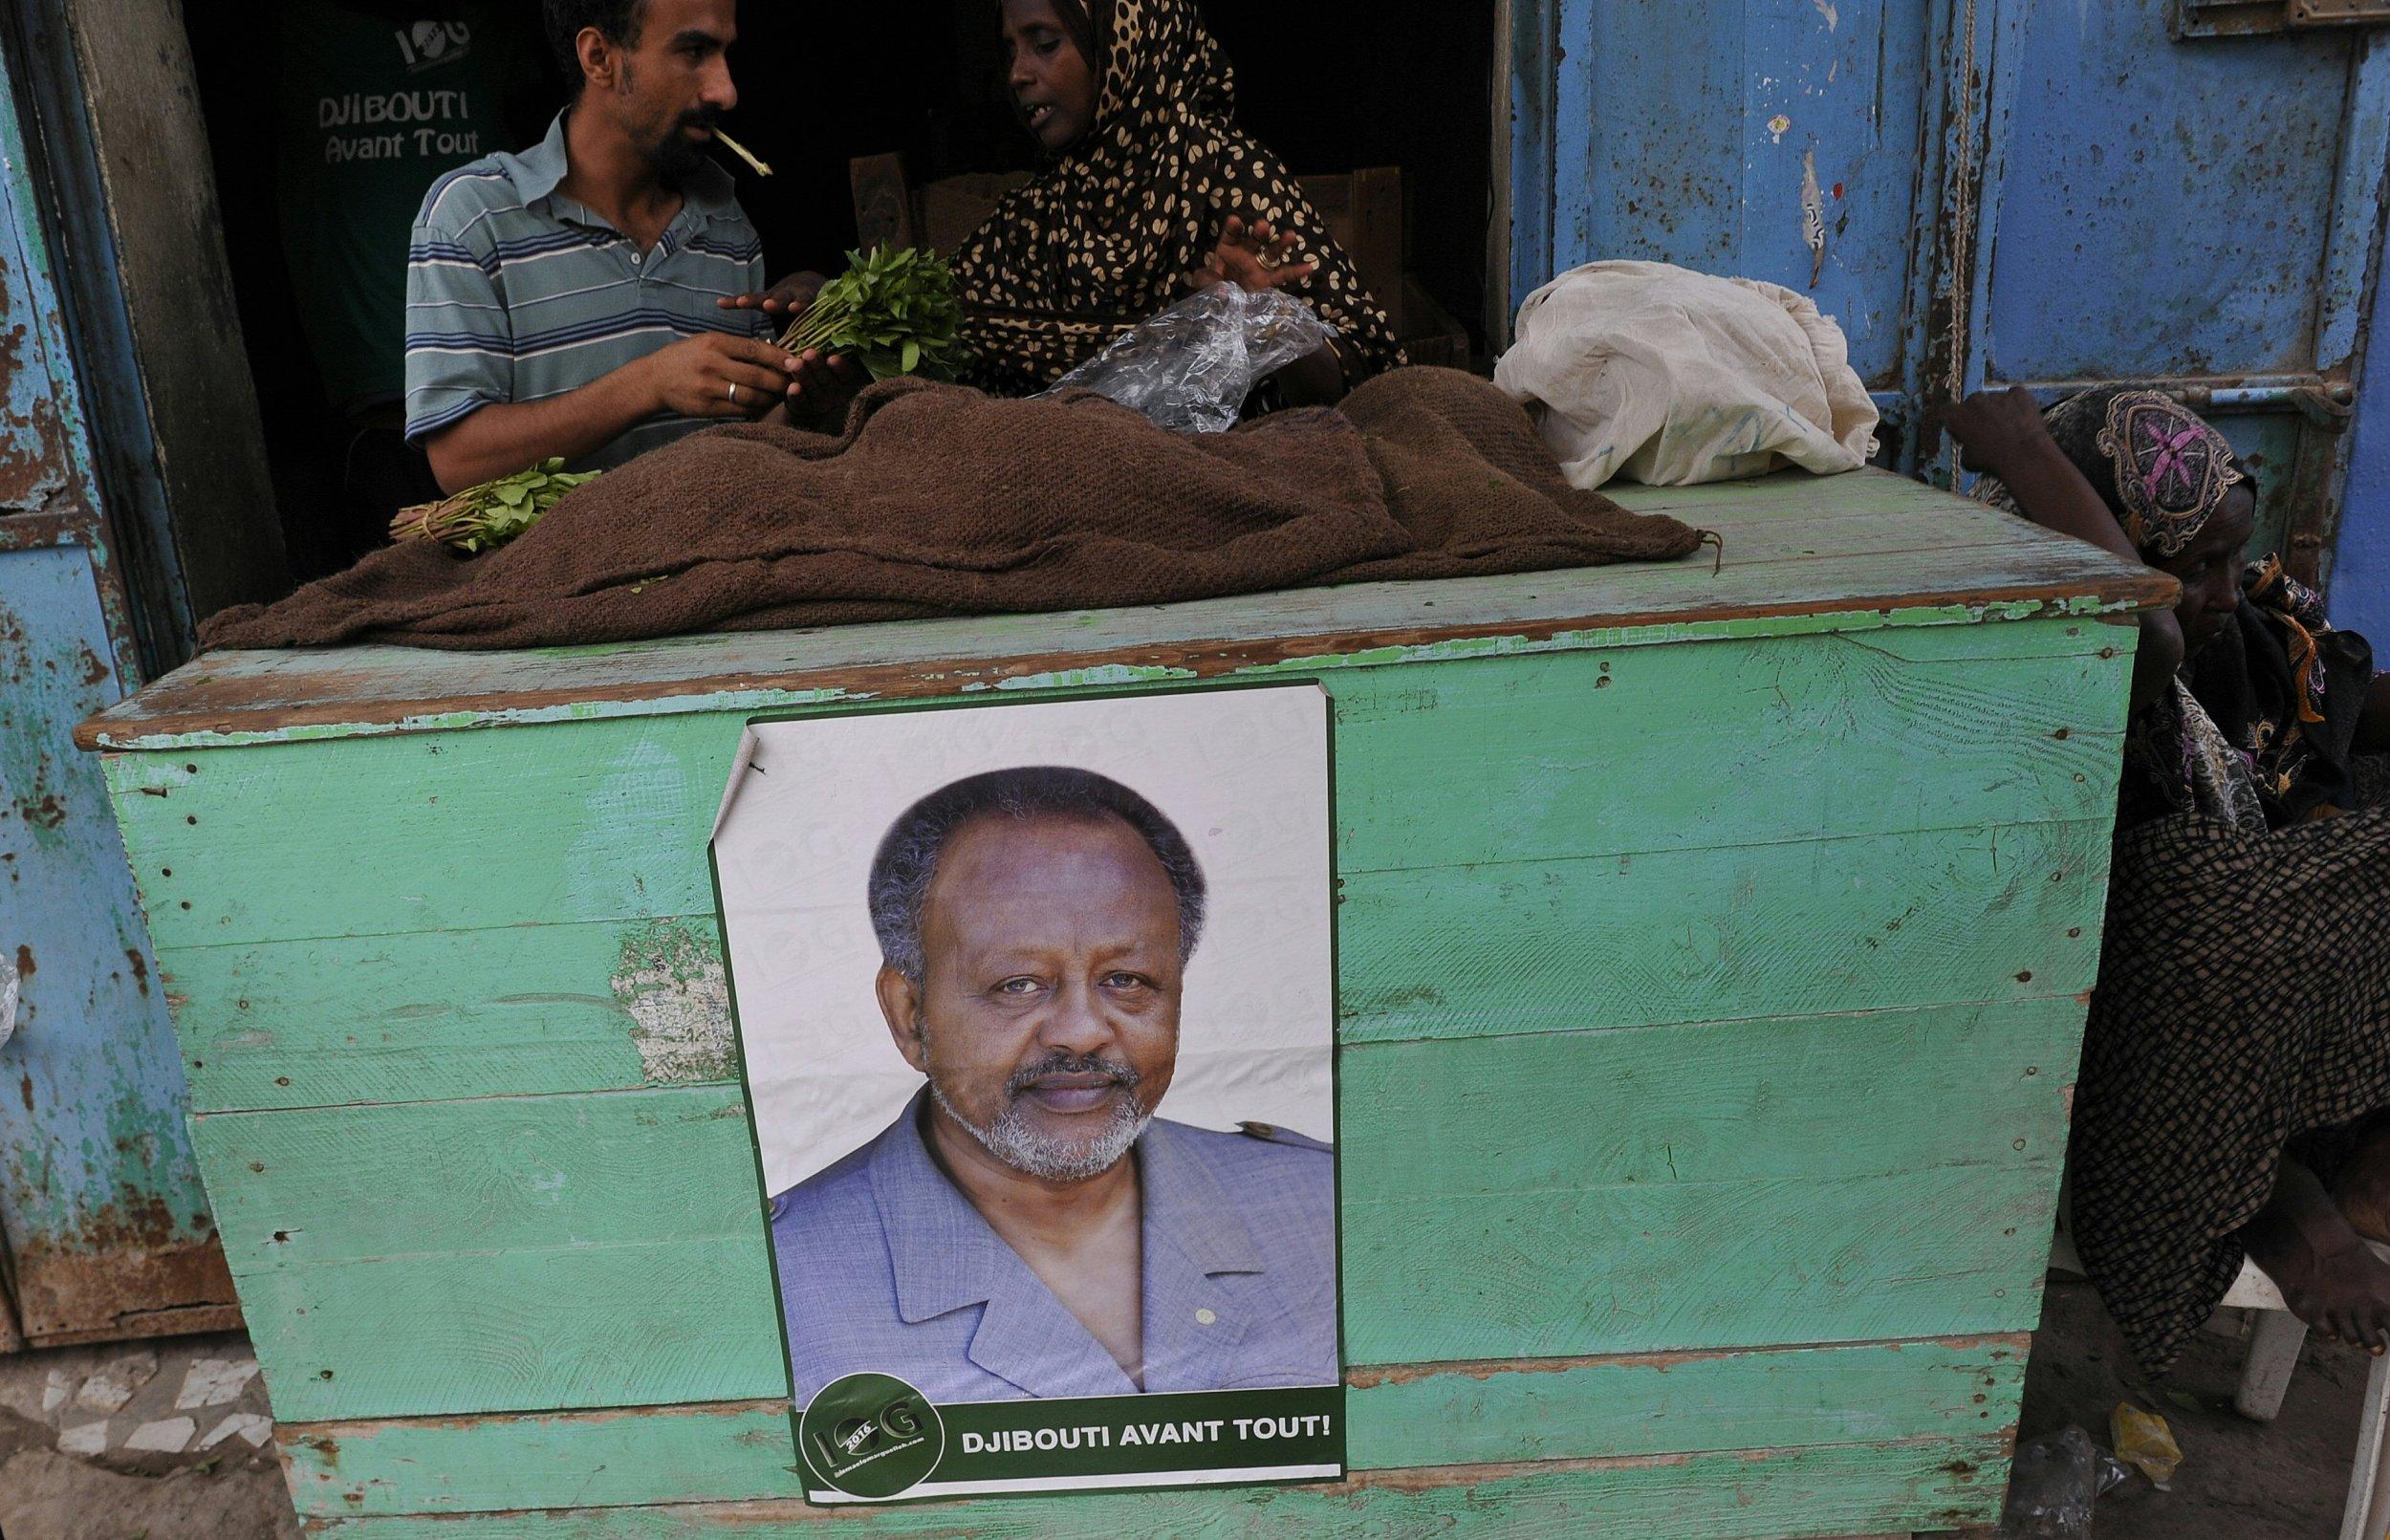 Poster of Djiboutian President Ismaïl Omar Guelleh.